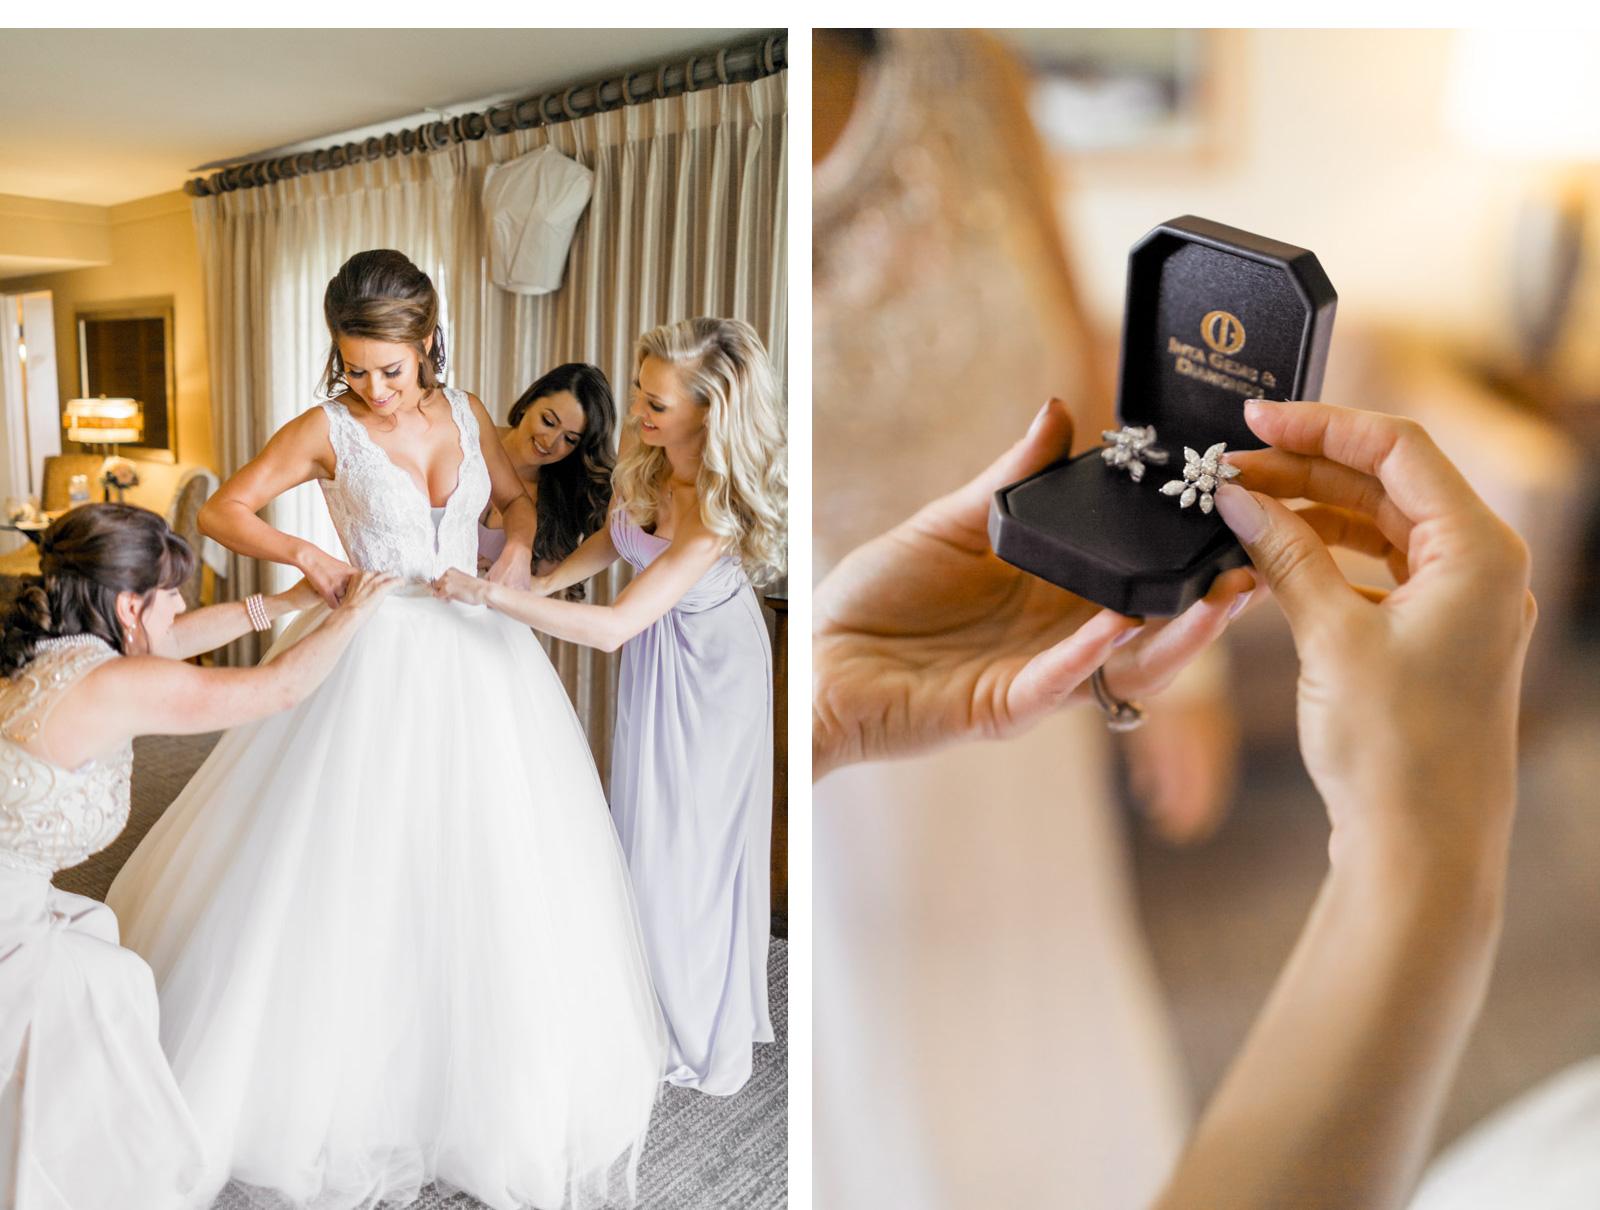 Nia-Sanchez-Southern-California-Wedding-Natalie-Schutt-Photography_02.jpg